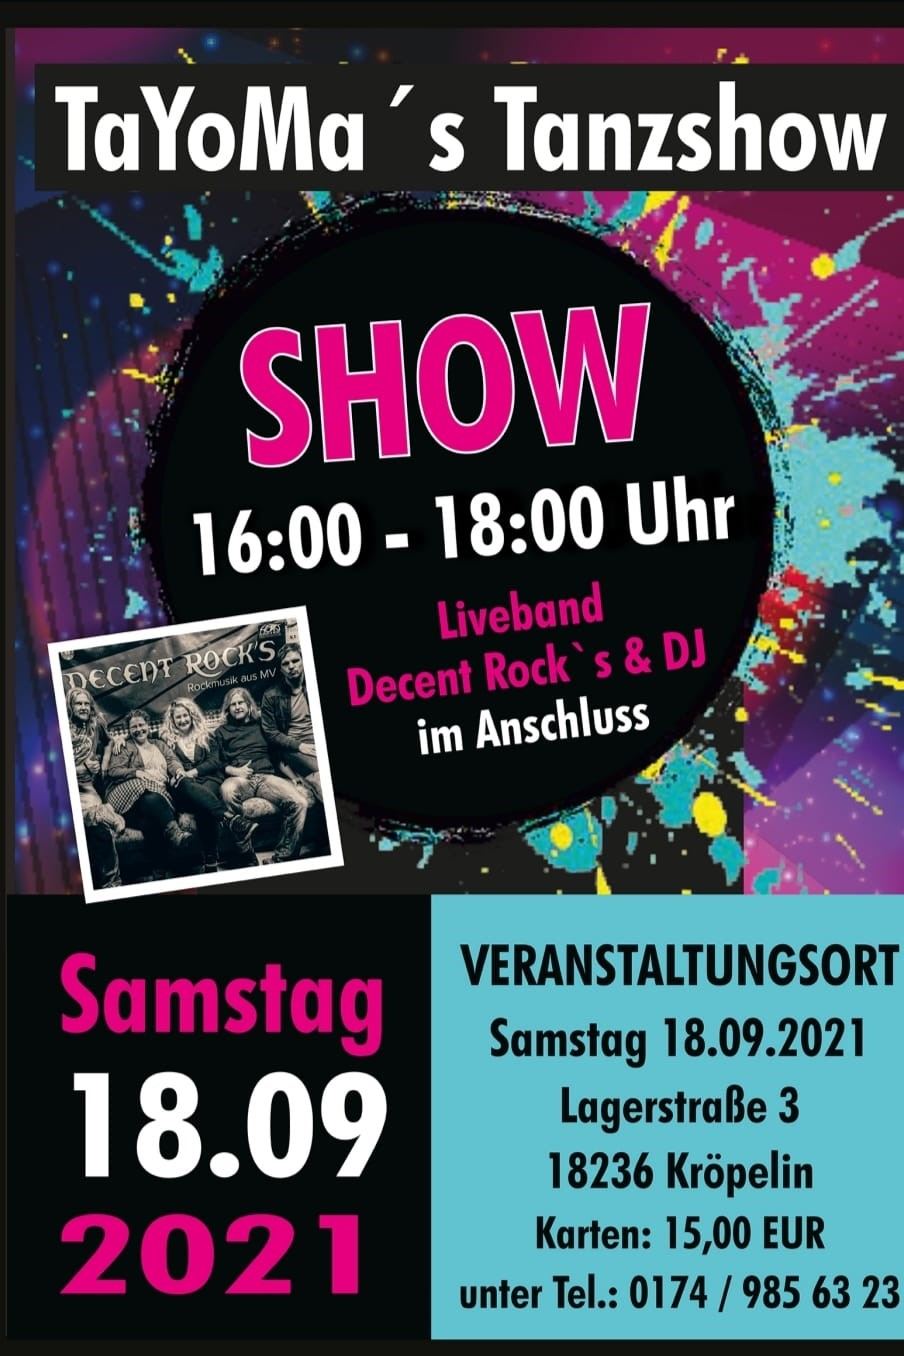 Tanzshow 2021